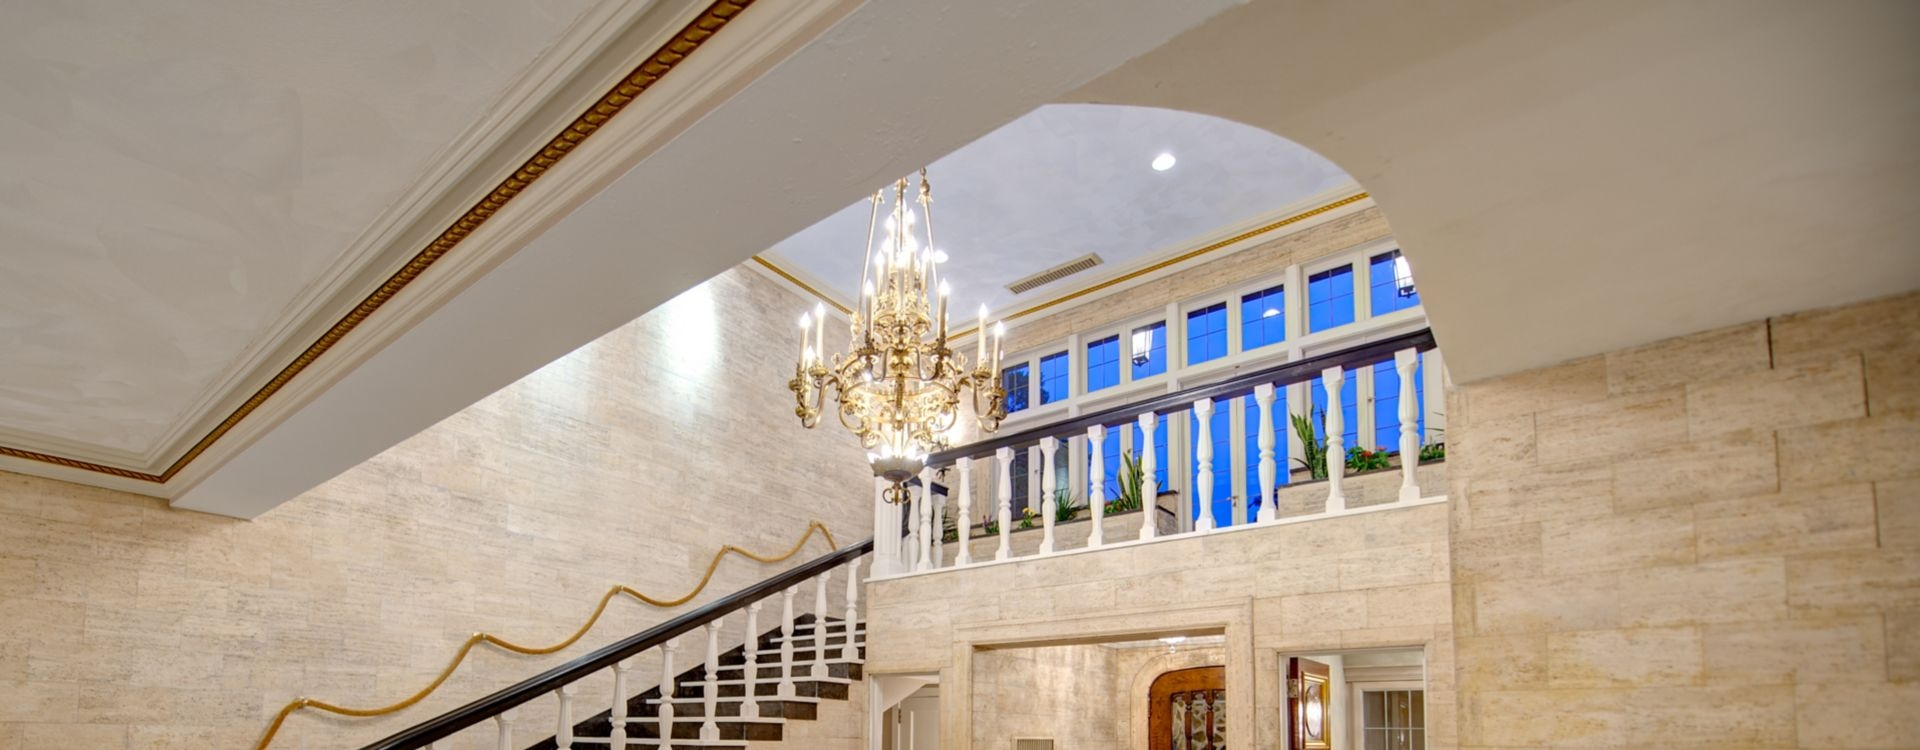 Entryway Foyer Tile Designs Trends Ideas For 2019 – The Tile Shop | Floor Tiles Design For Stairs | Hallway Floor Tile | Stair Landing | House | Stair Riser | Wall